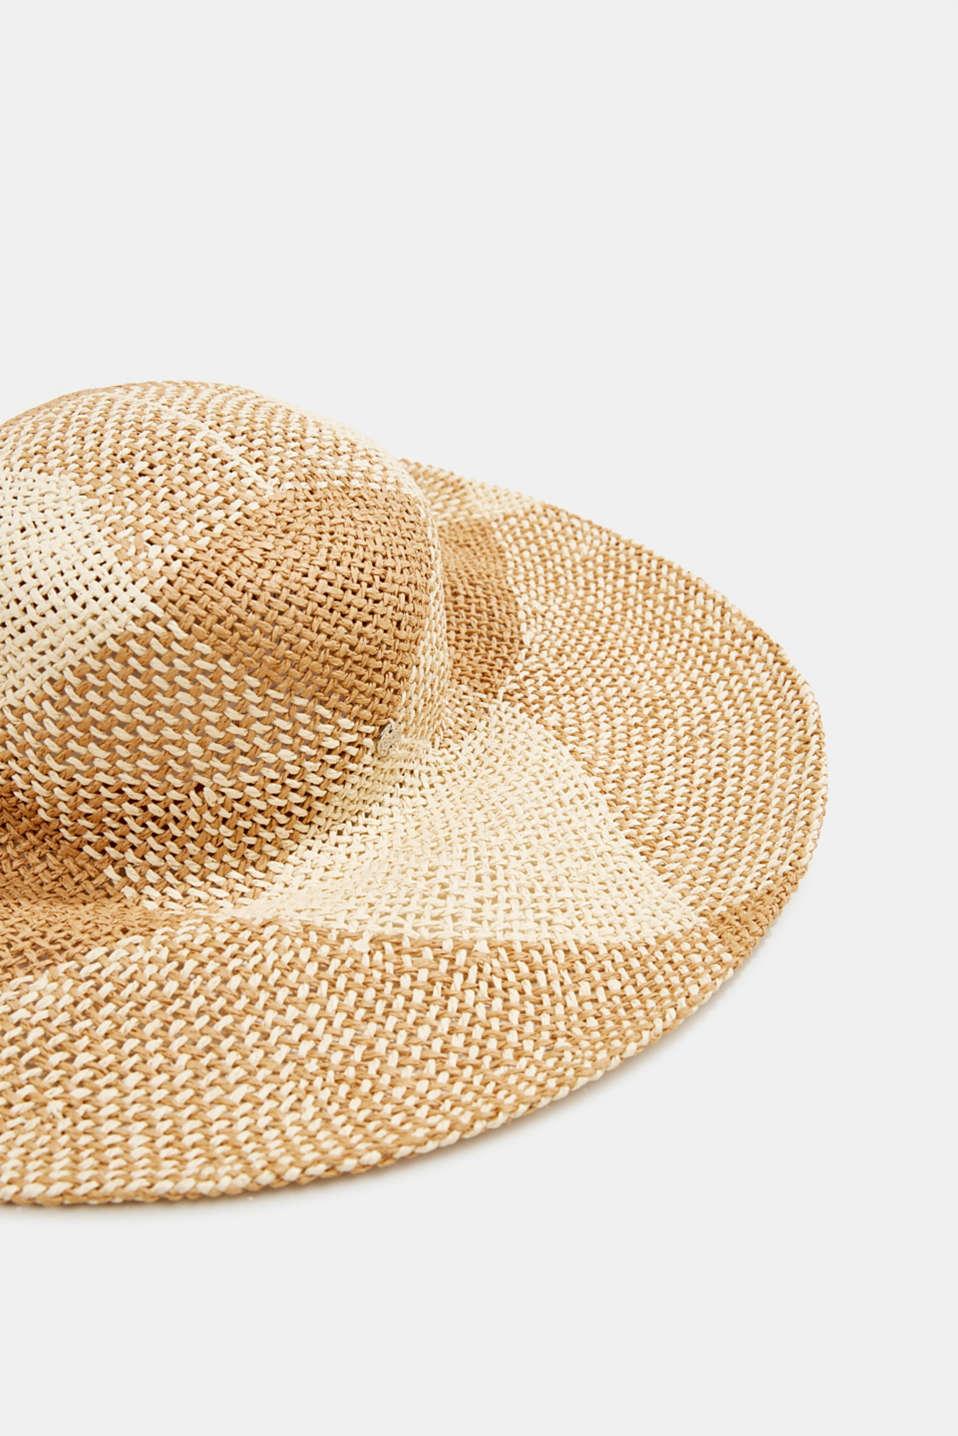 Hand-made straw hat, BEIGE, detail image number 1